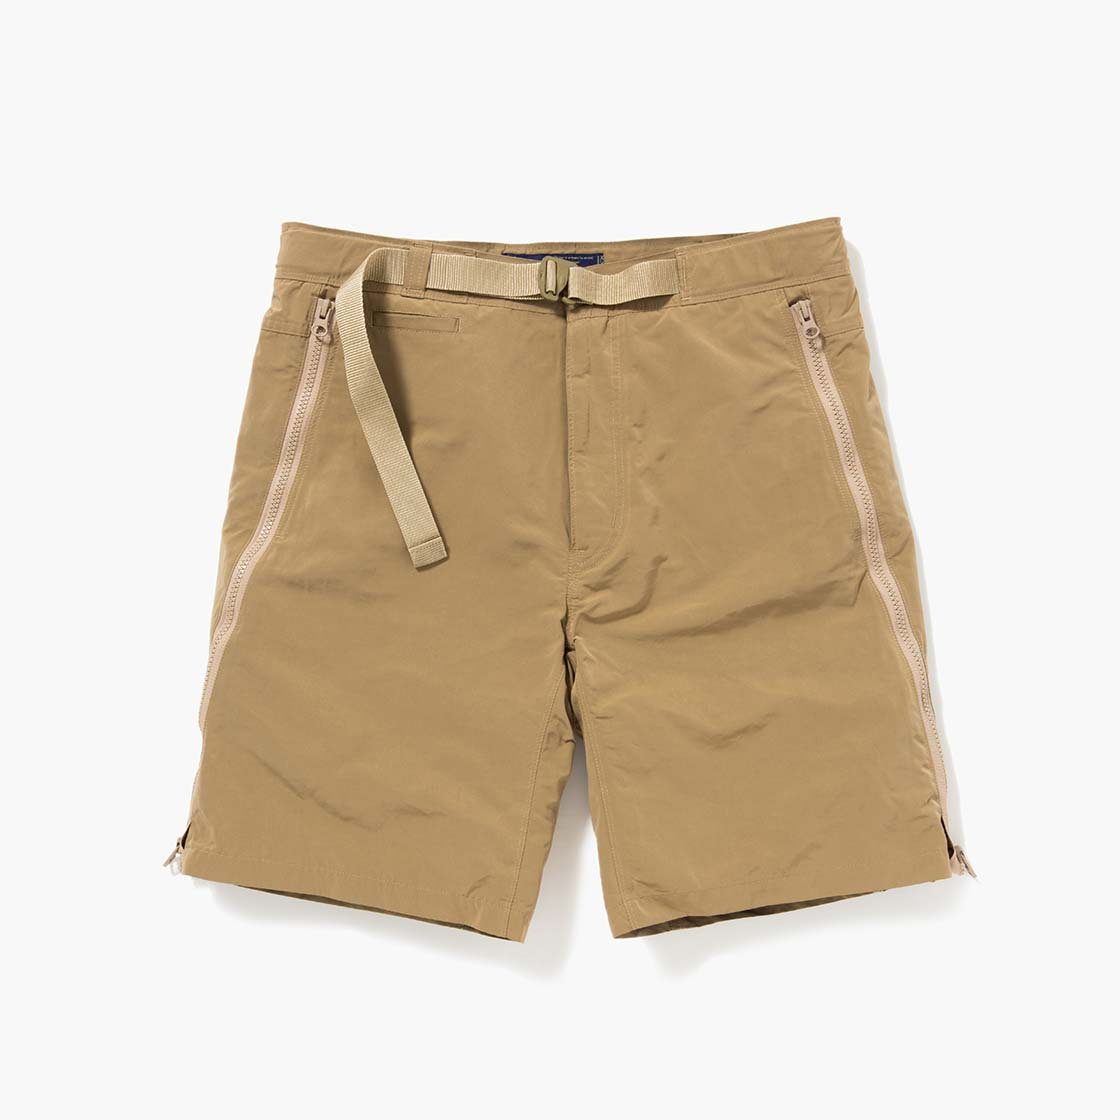 Ventile Loop Zip Board Shorts